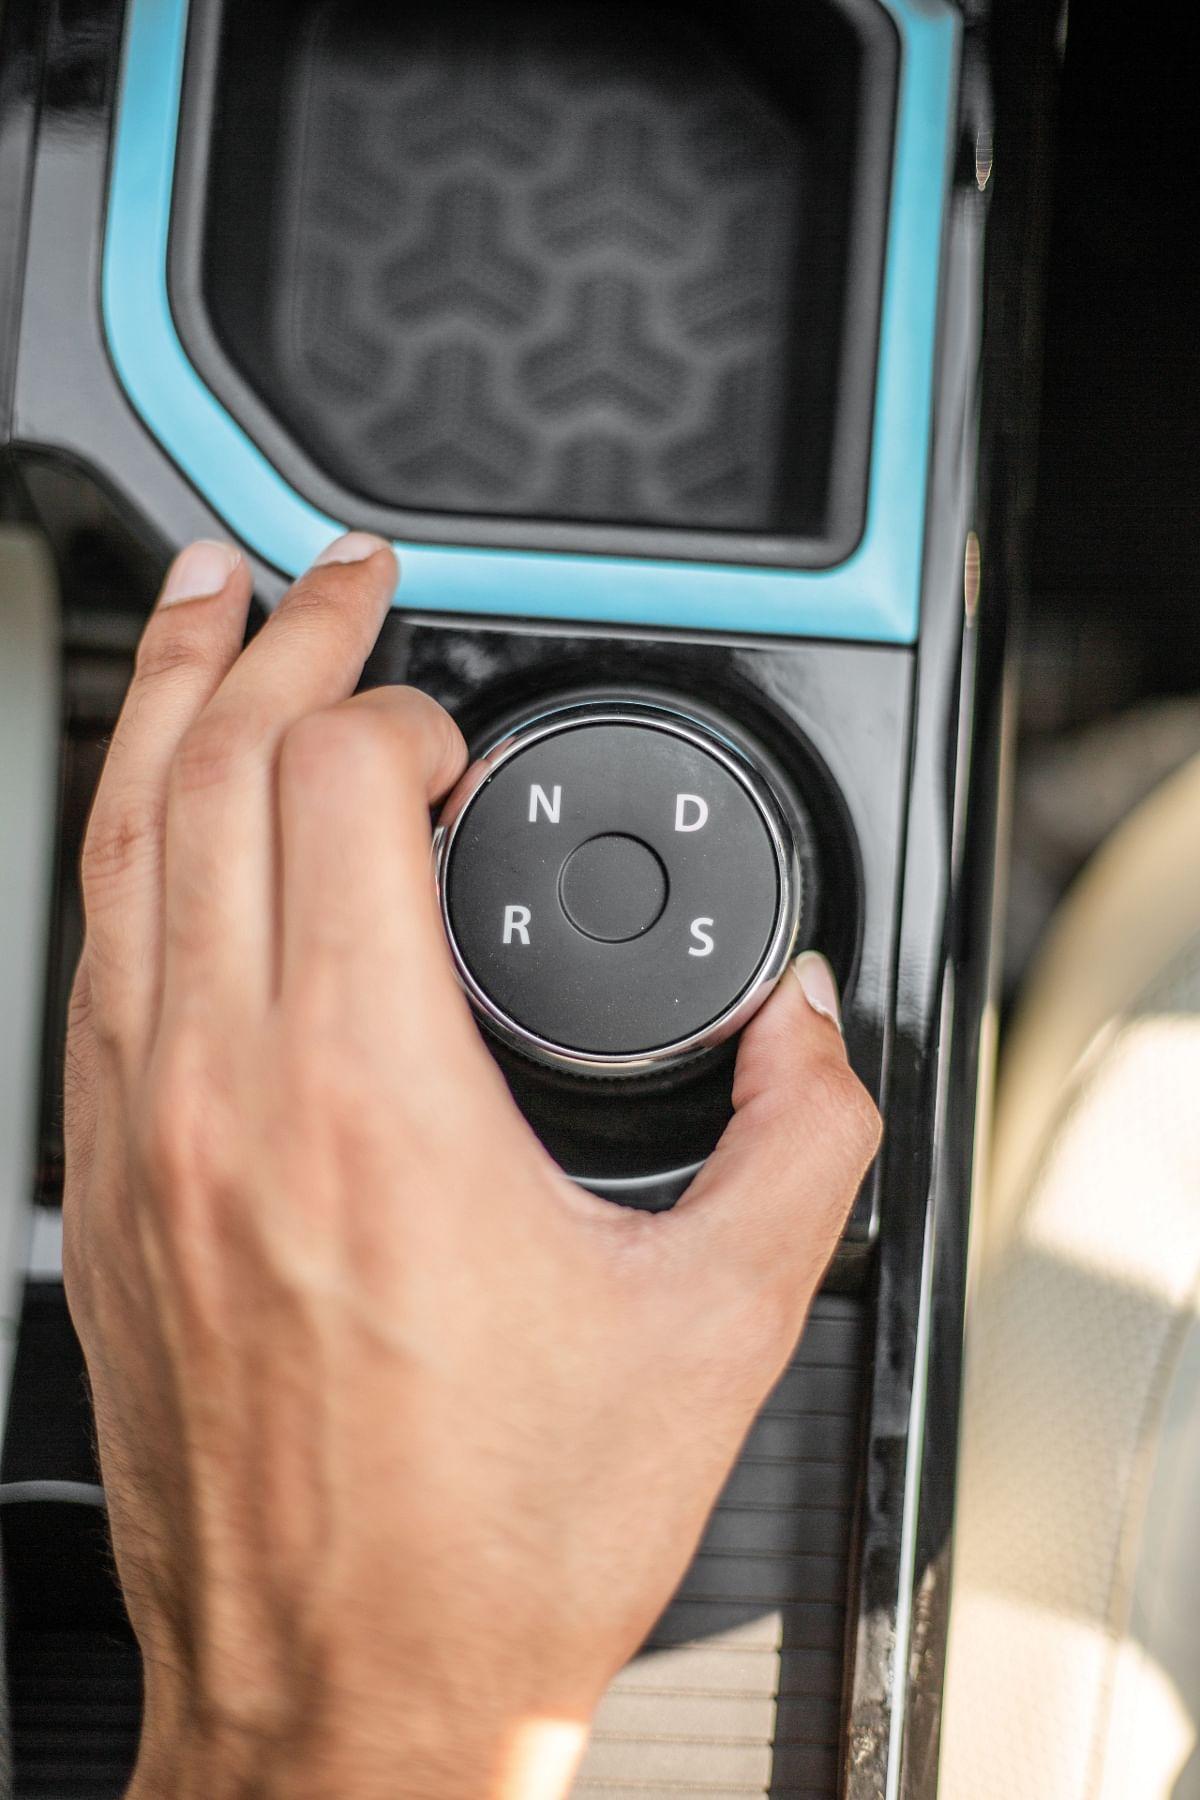 The Nexon EV gets two drive modes while the Nexon petrol has three